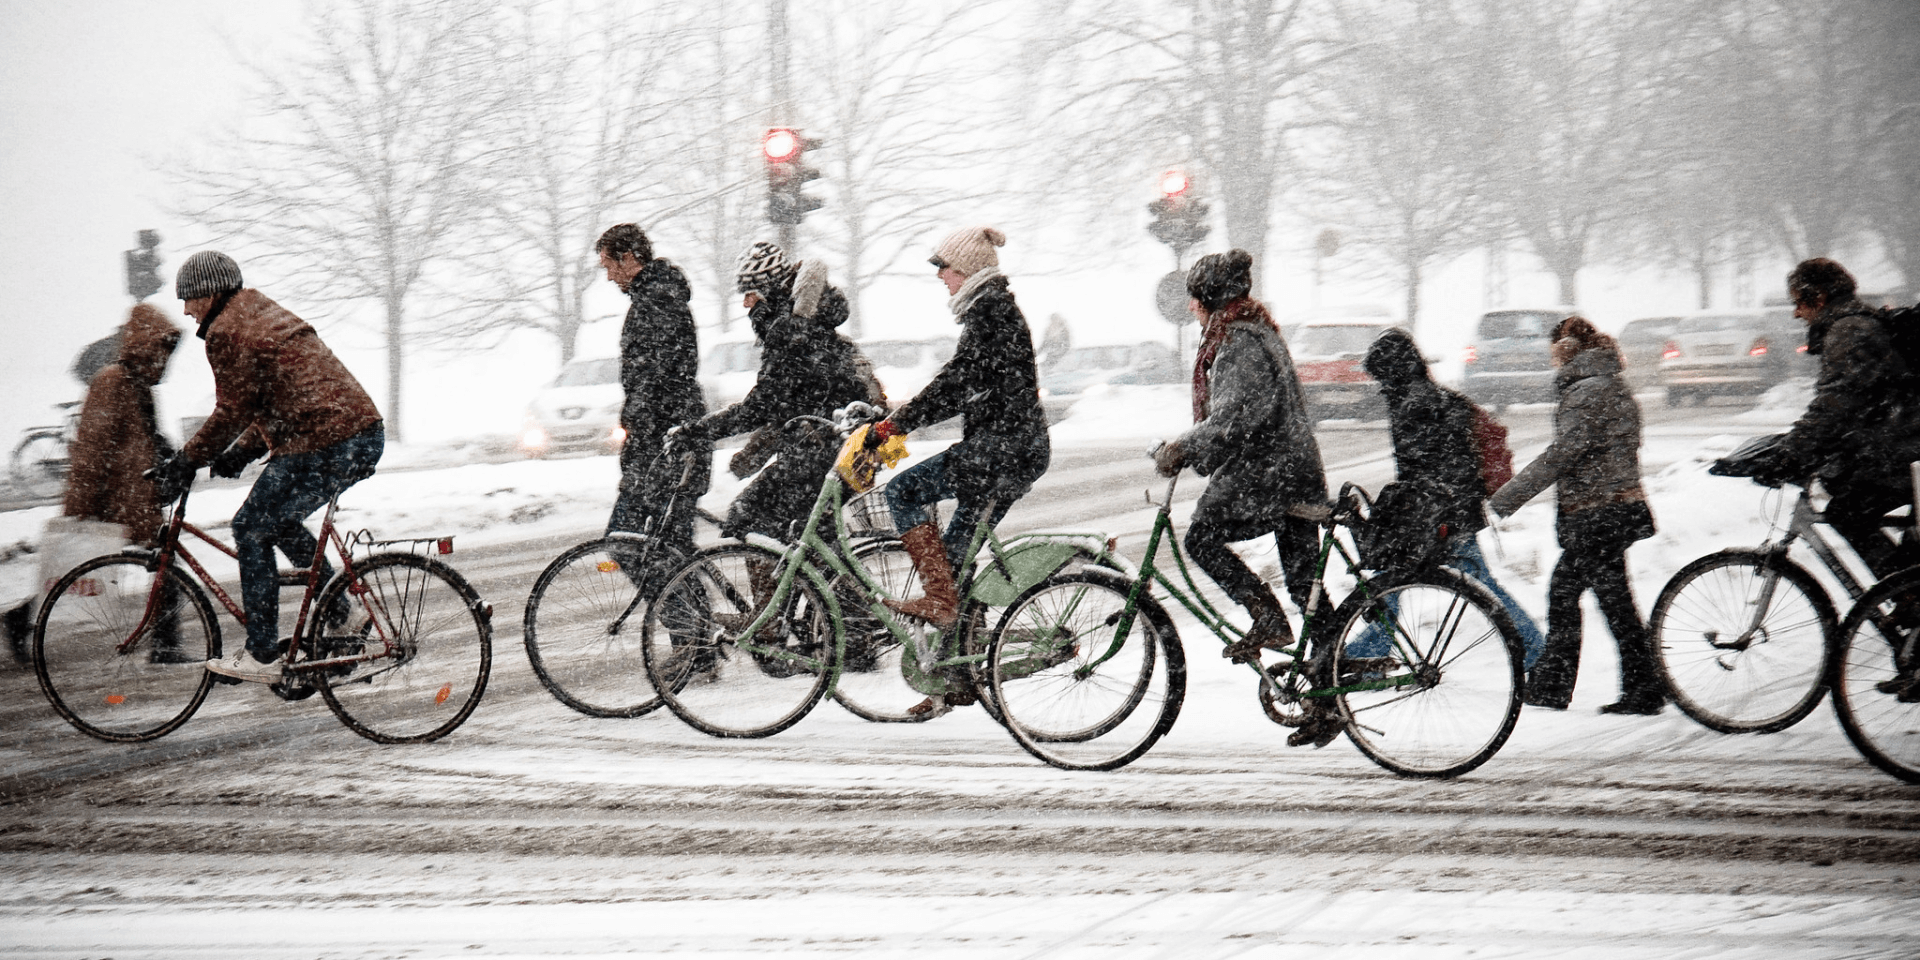 Cycling in the snow, Copenhagen